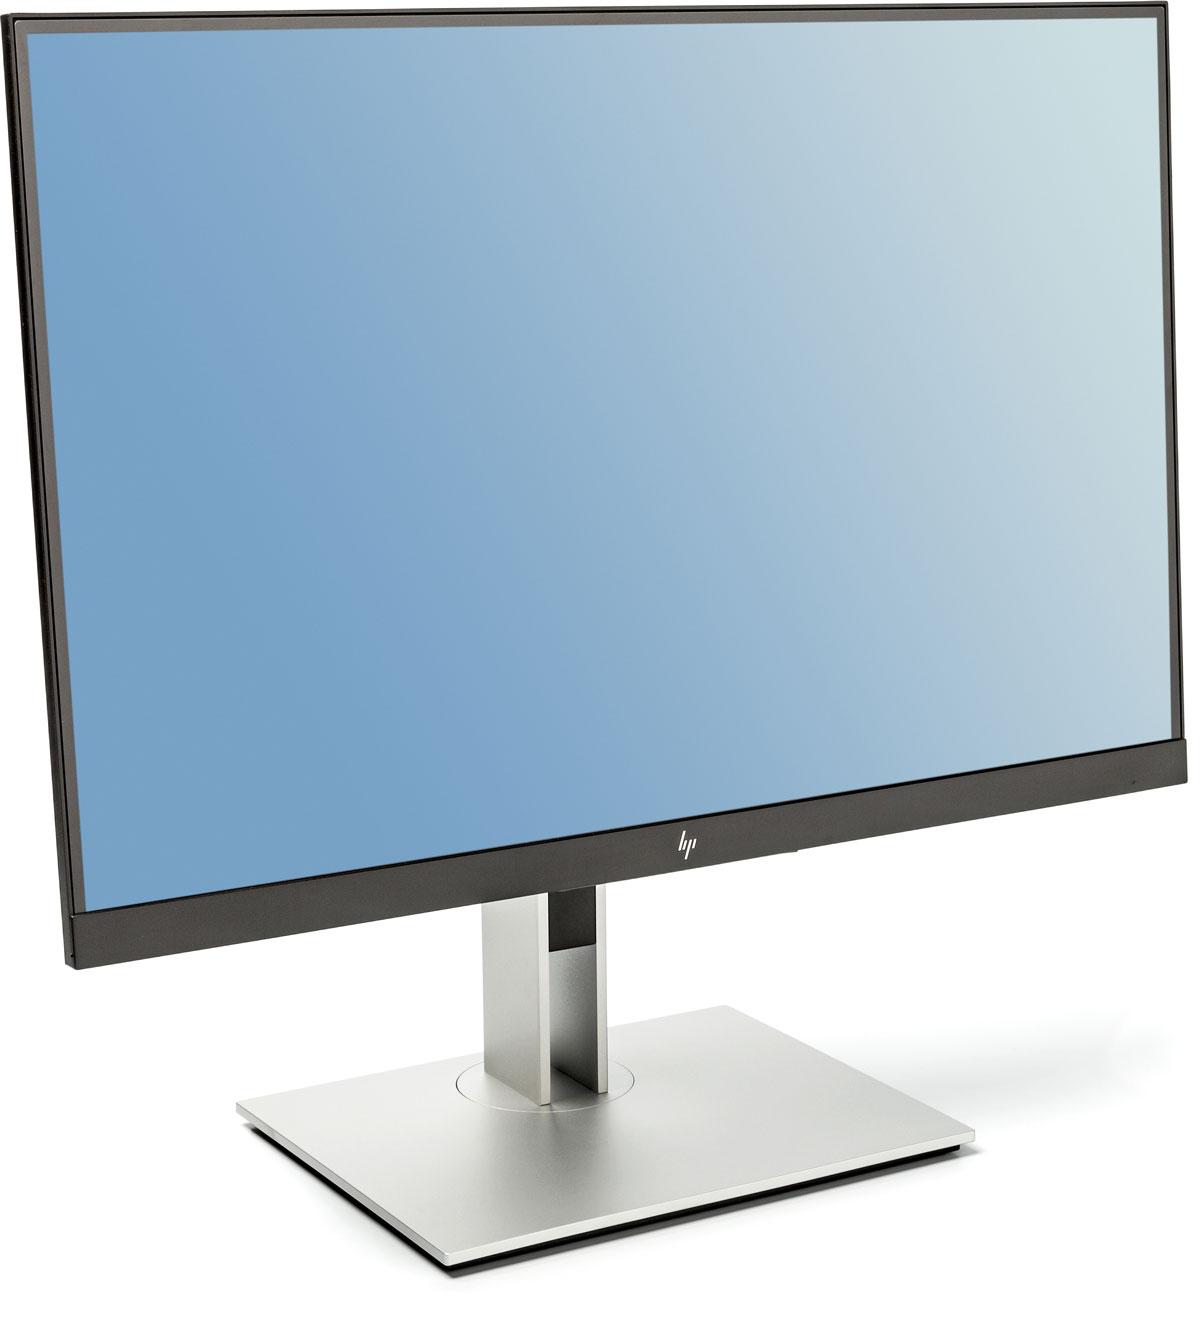 HP monitor schermhoogte kleur